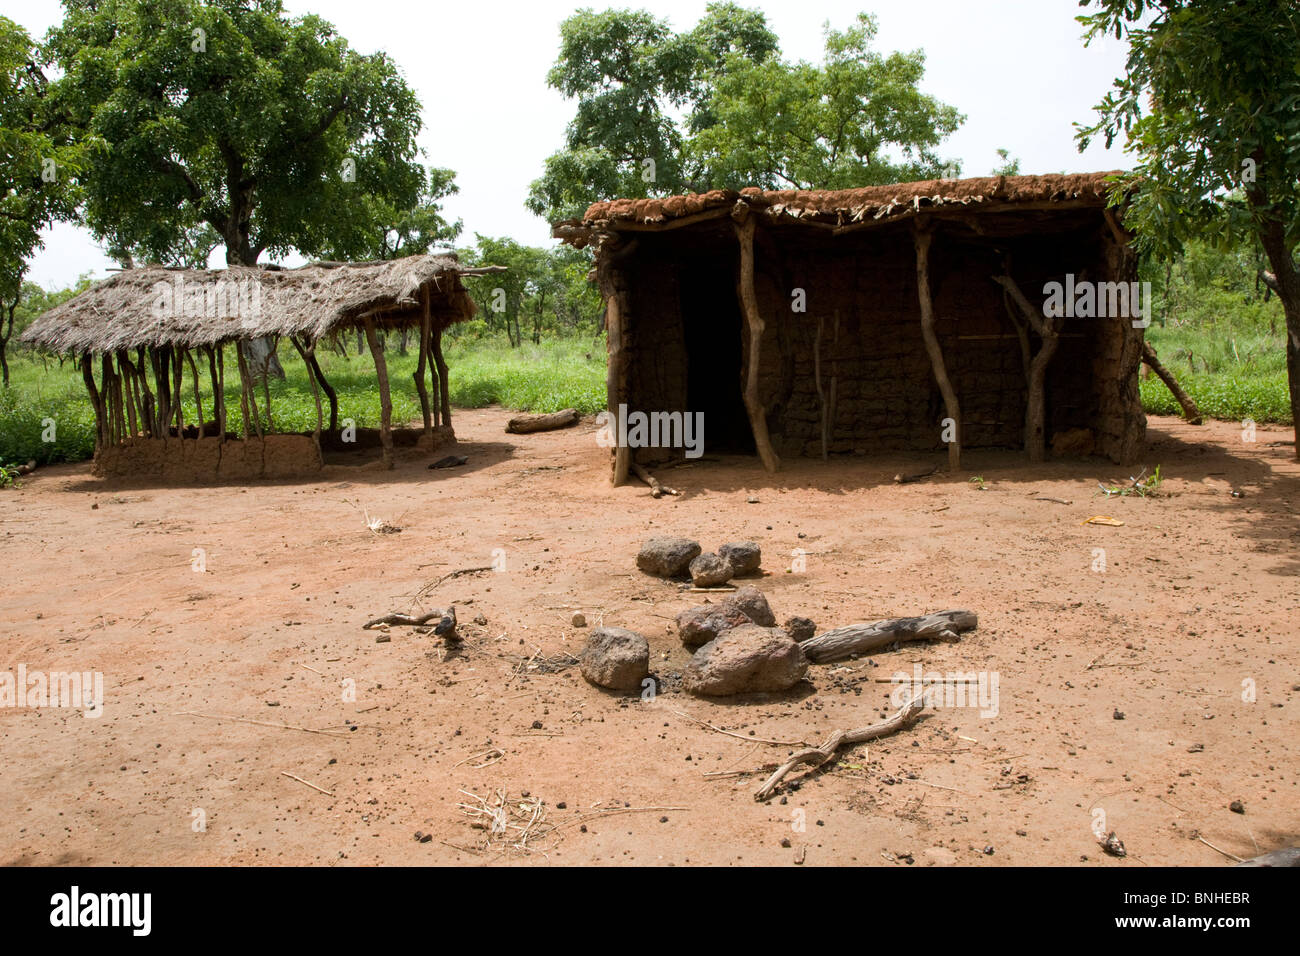 Abandoned homestead in the Gonja triangle, Damango district, Ghana. Stock Photo